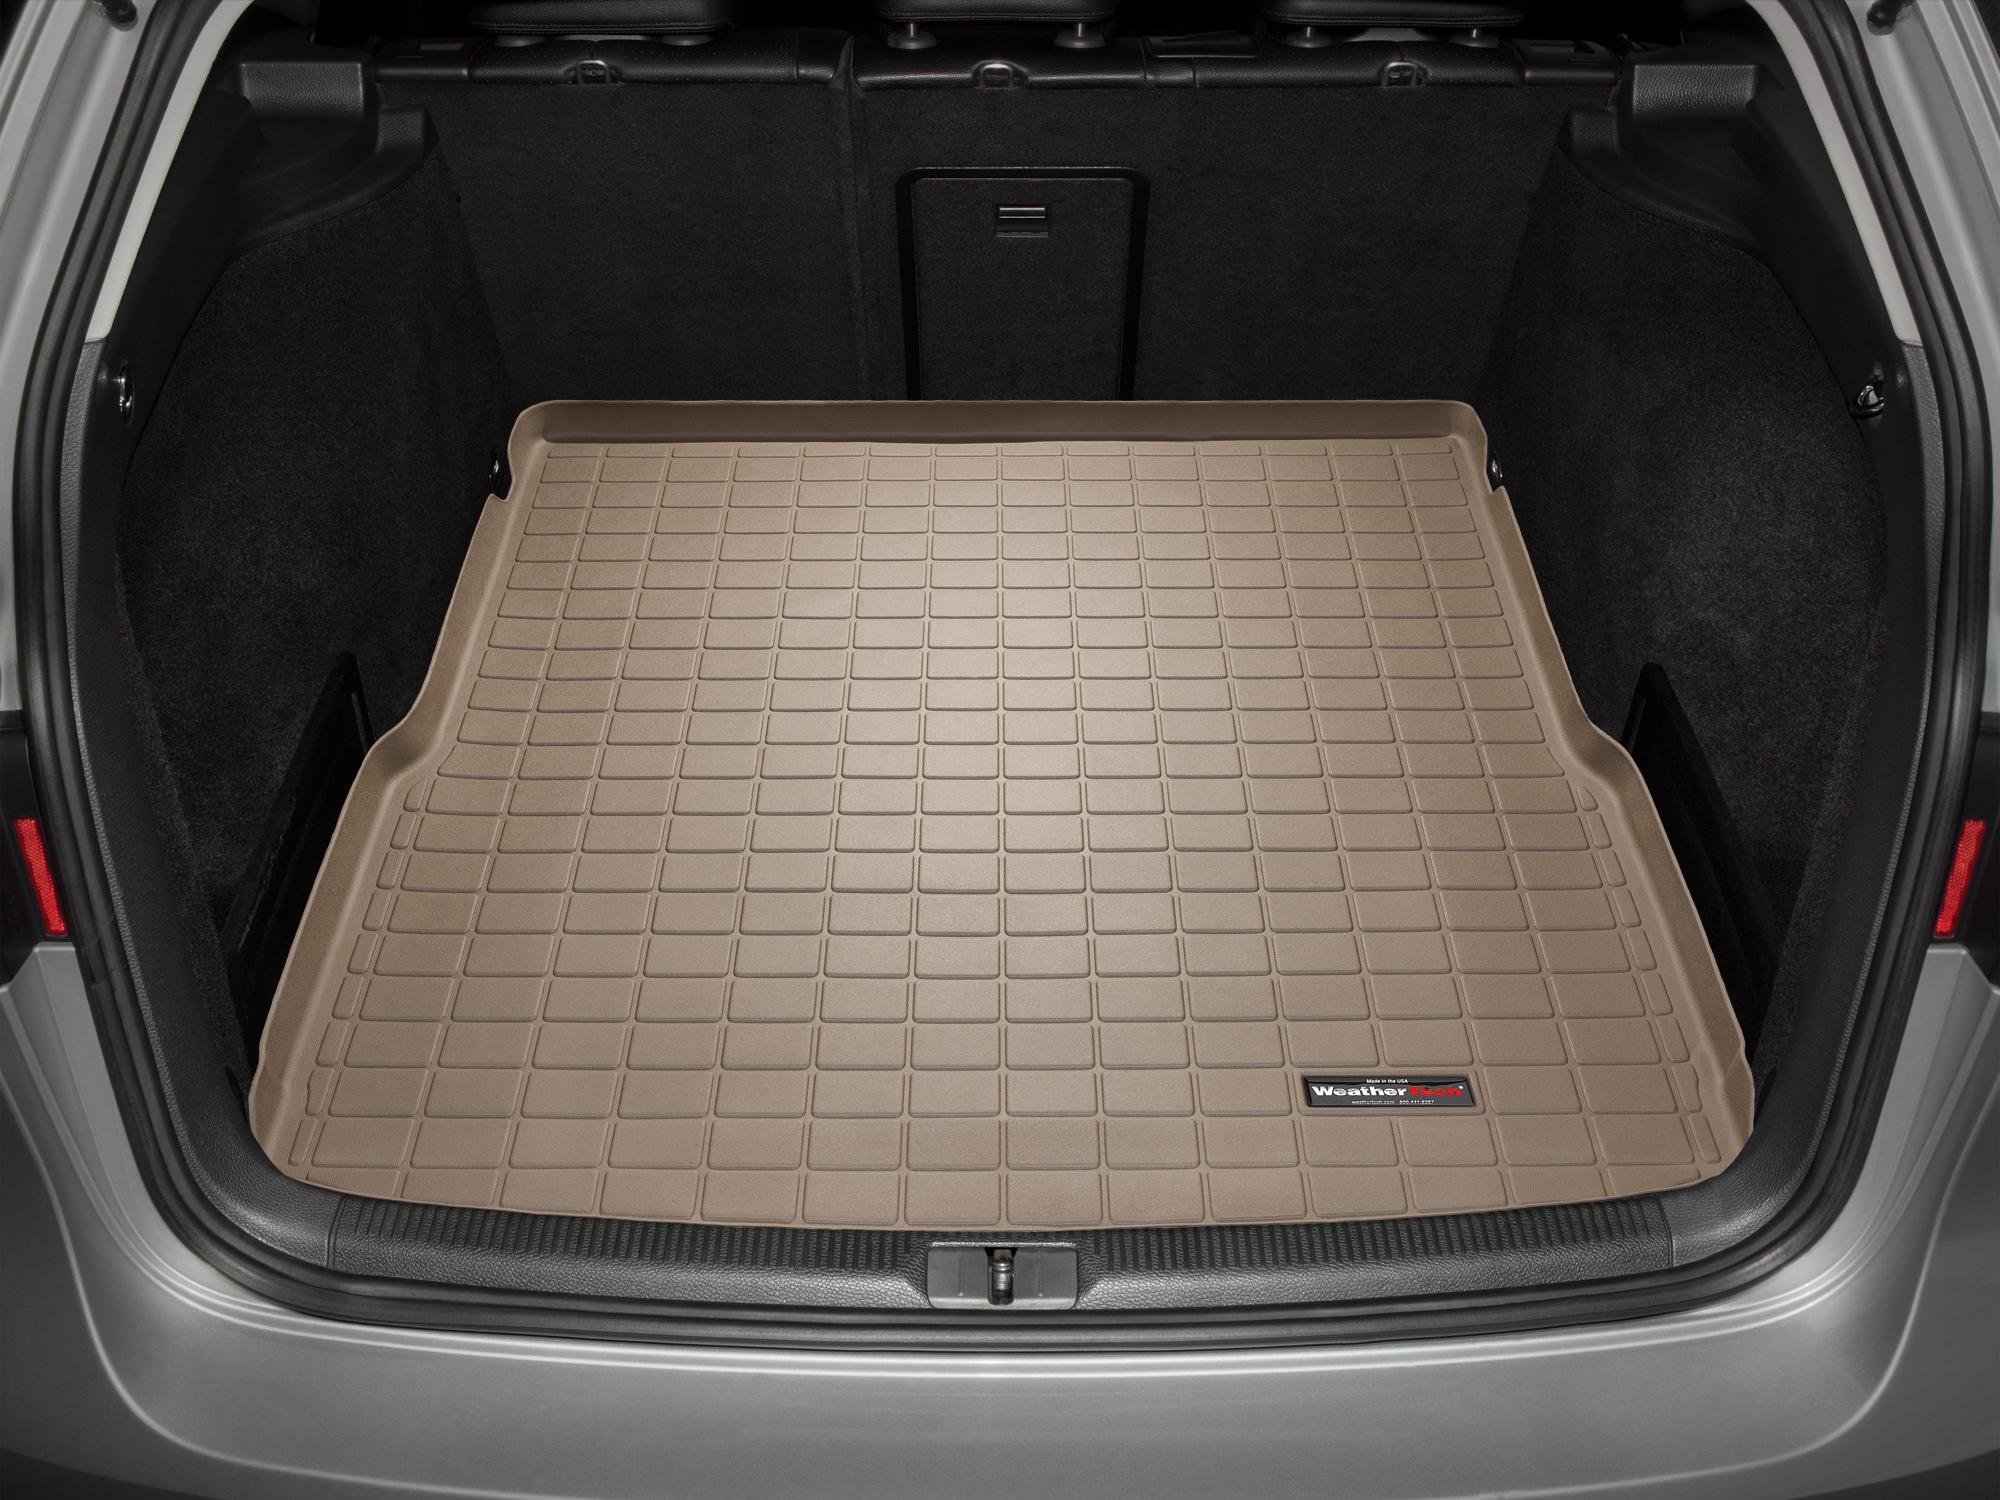 Volkswagen Passat 2014>2014 Vasca baule tappeto bagagliaio marrone *1406